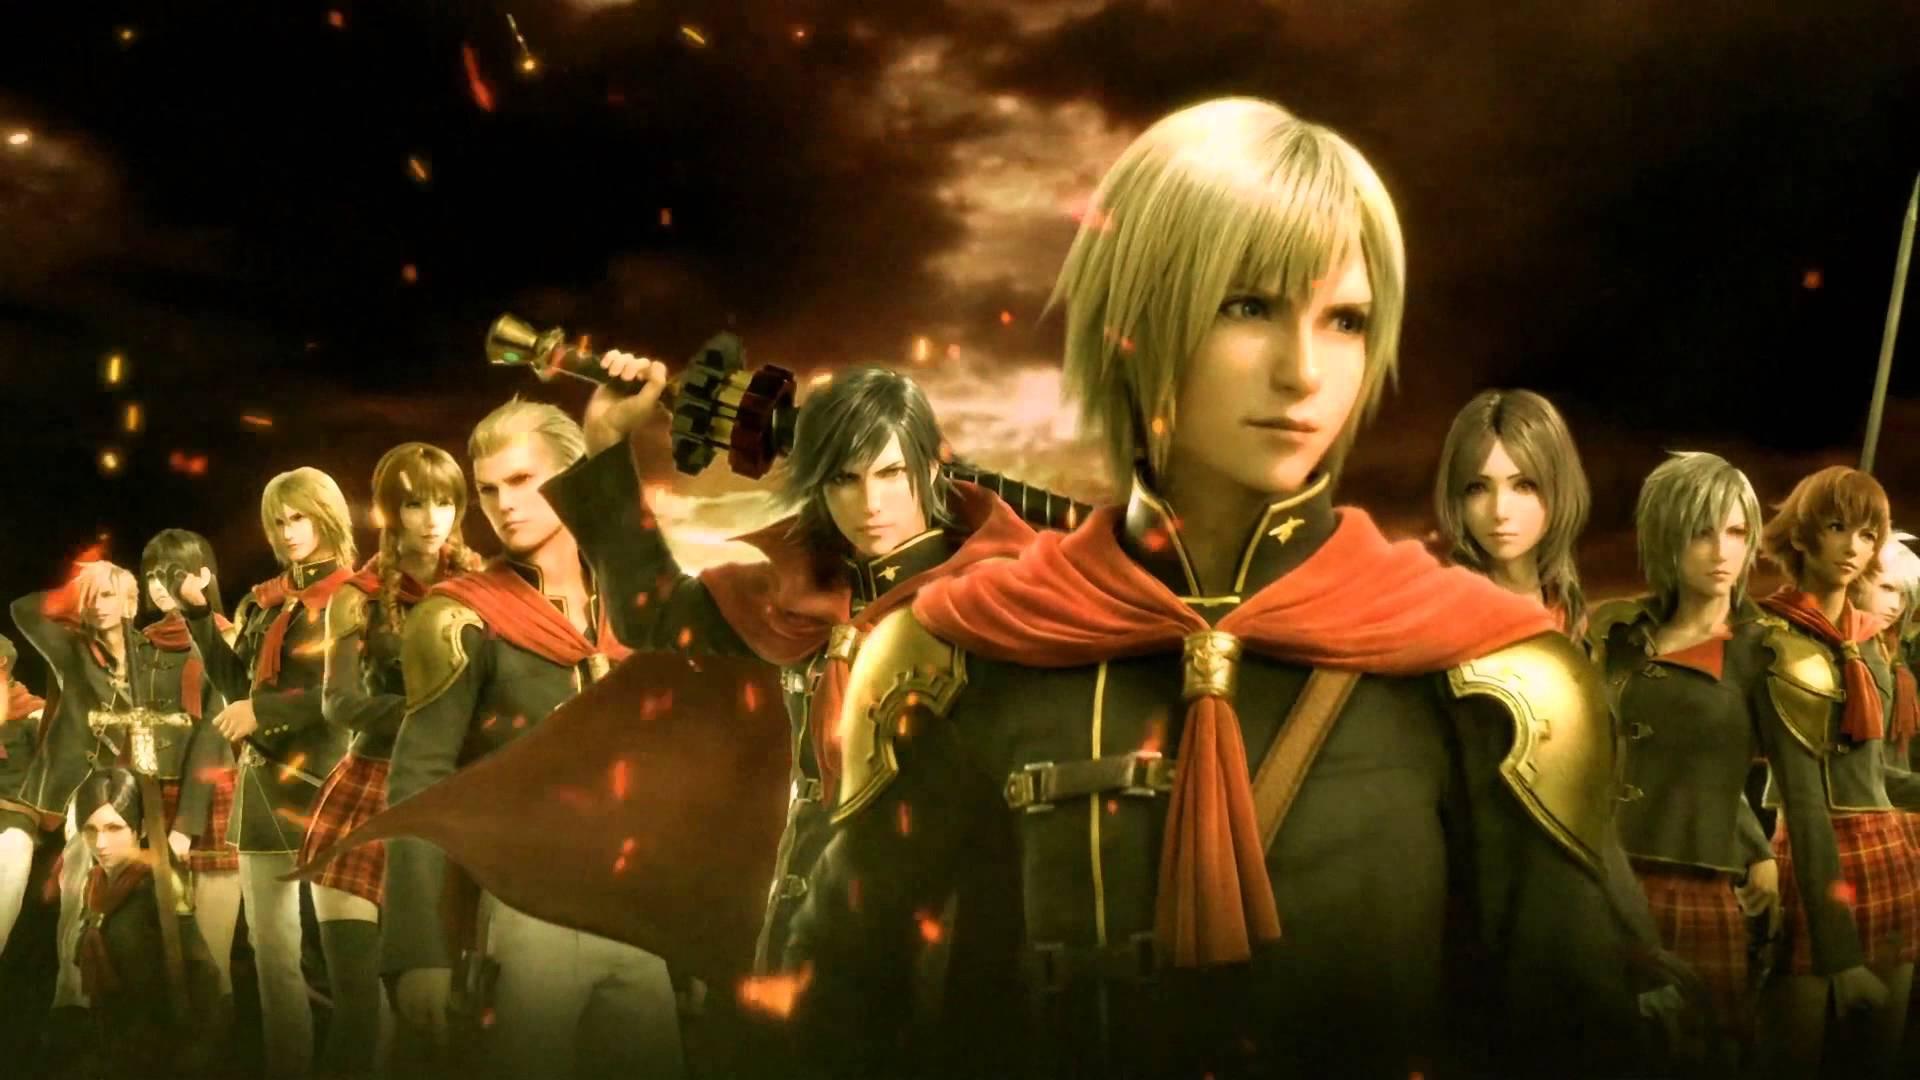 Final Fantasy Type-0 HD Cast Team Zero Members Lineup Wallpaper